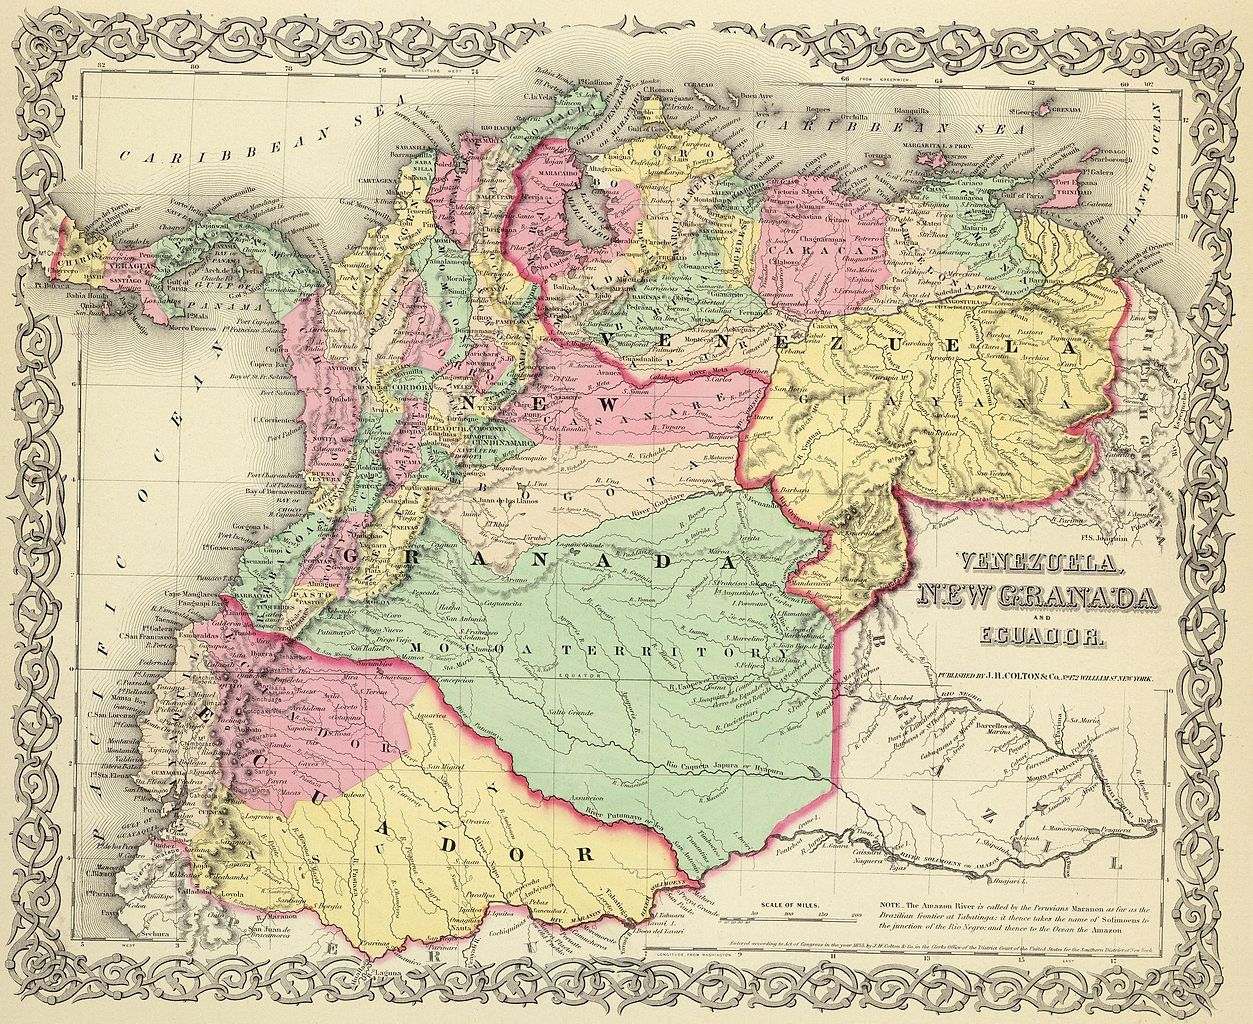 FileMap Of Venezuela New Granada And Ecuador 1855jpg